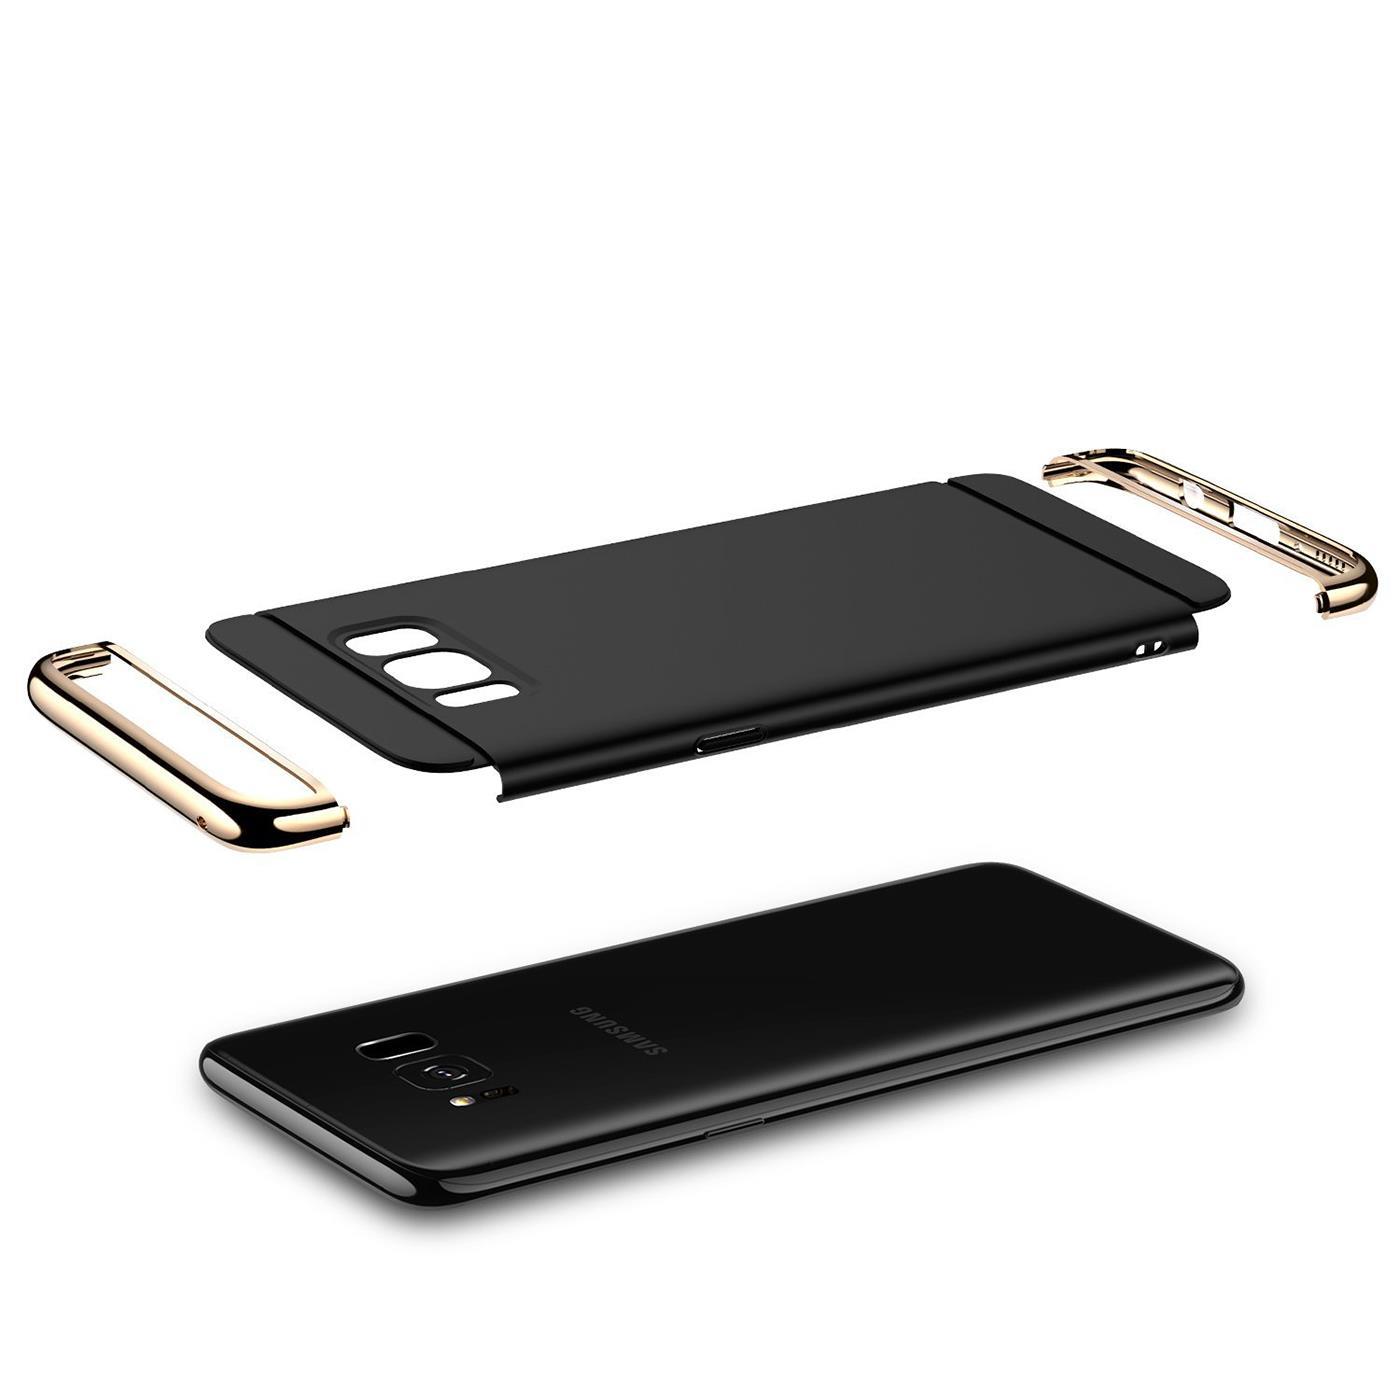 Samsung-Galaxy-S8-Hard-Back-Case-Cover-Thin-Bumper-Slim-Shockproof-Rugged-Thin thumbnail 10